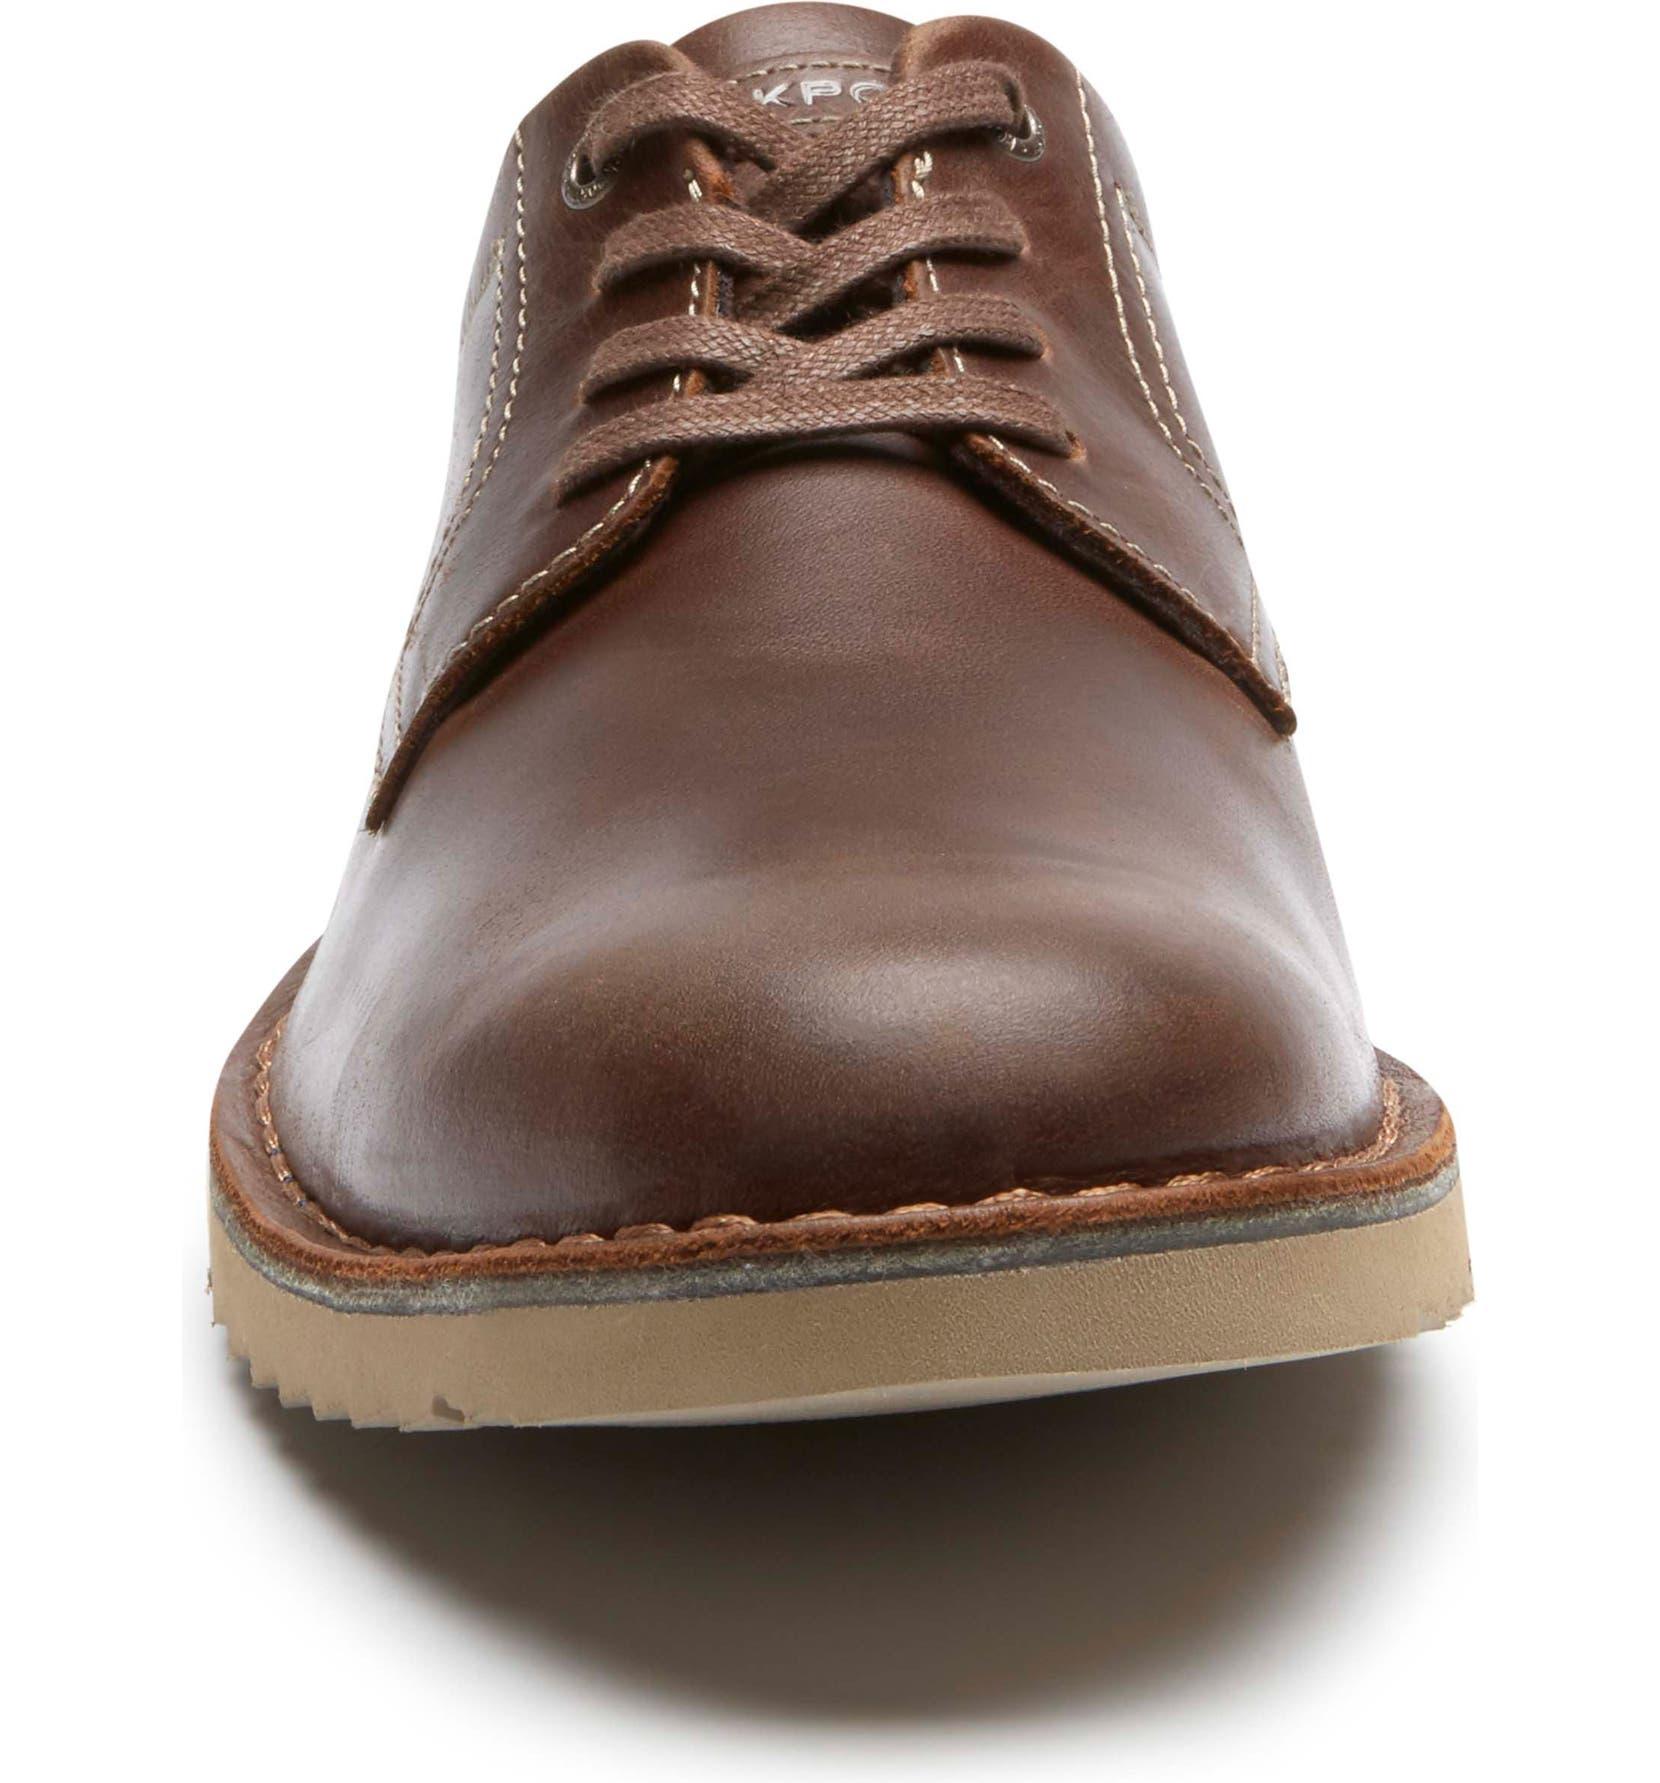 Plain Toe Toe RockportCabot RockportCabot Chaussures Po Plain Po Chaussures rxoCBed